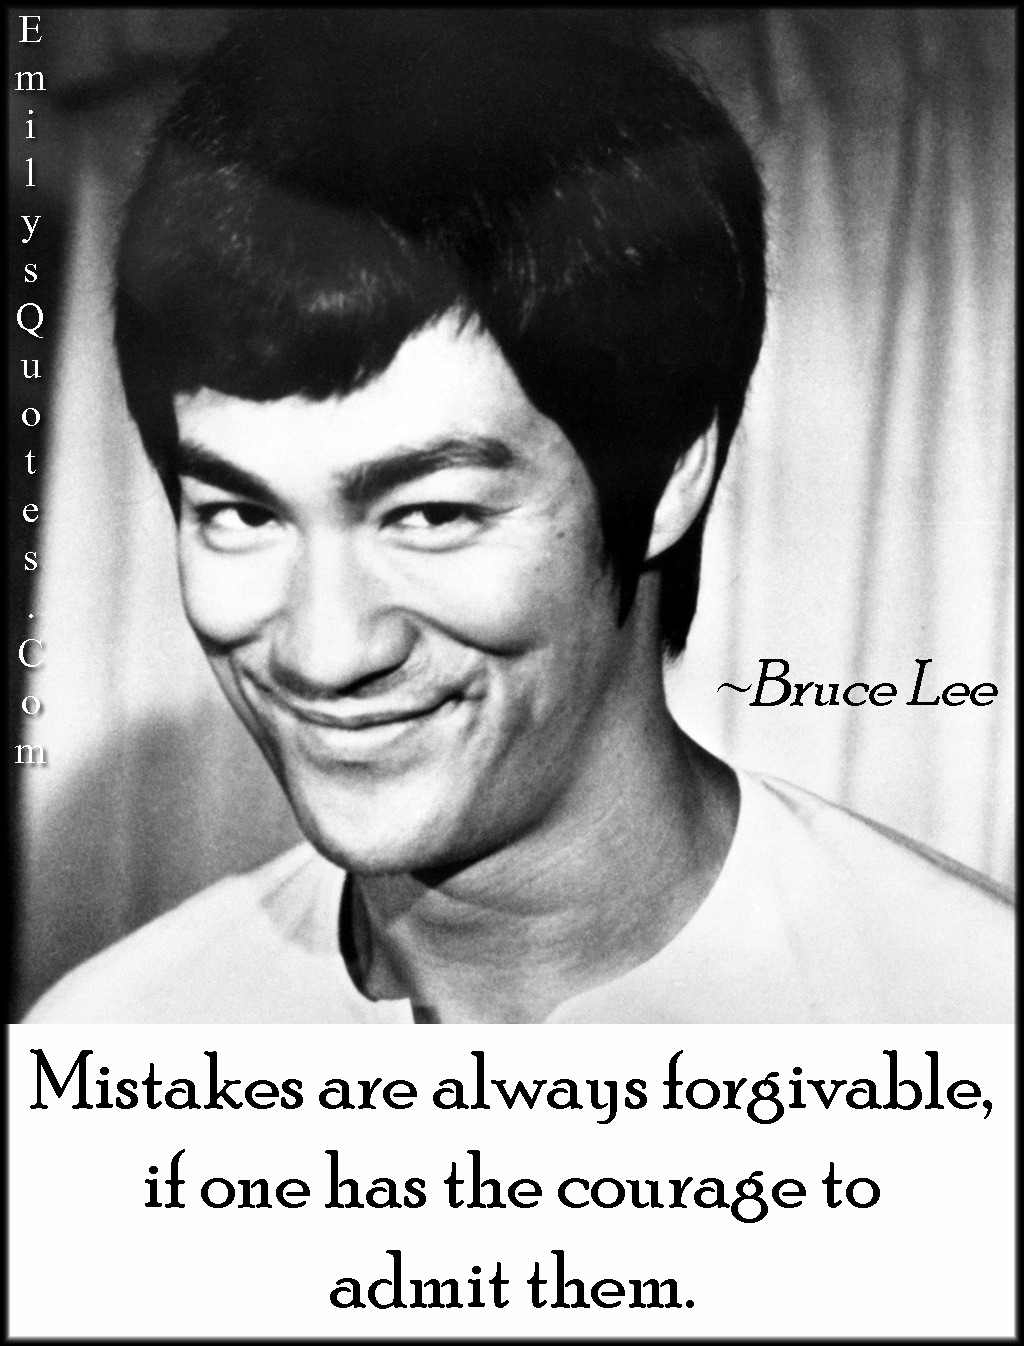 EmilysQuotes.Com - mistakes, courage, forgive, admit, great, amazing, Bruce Lee